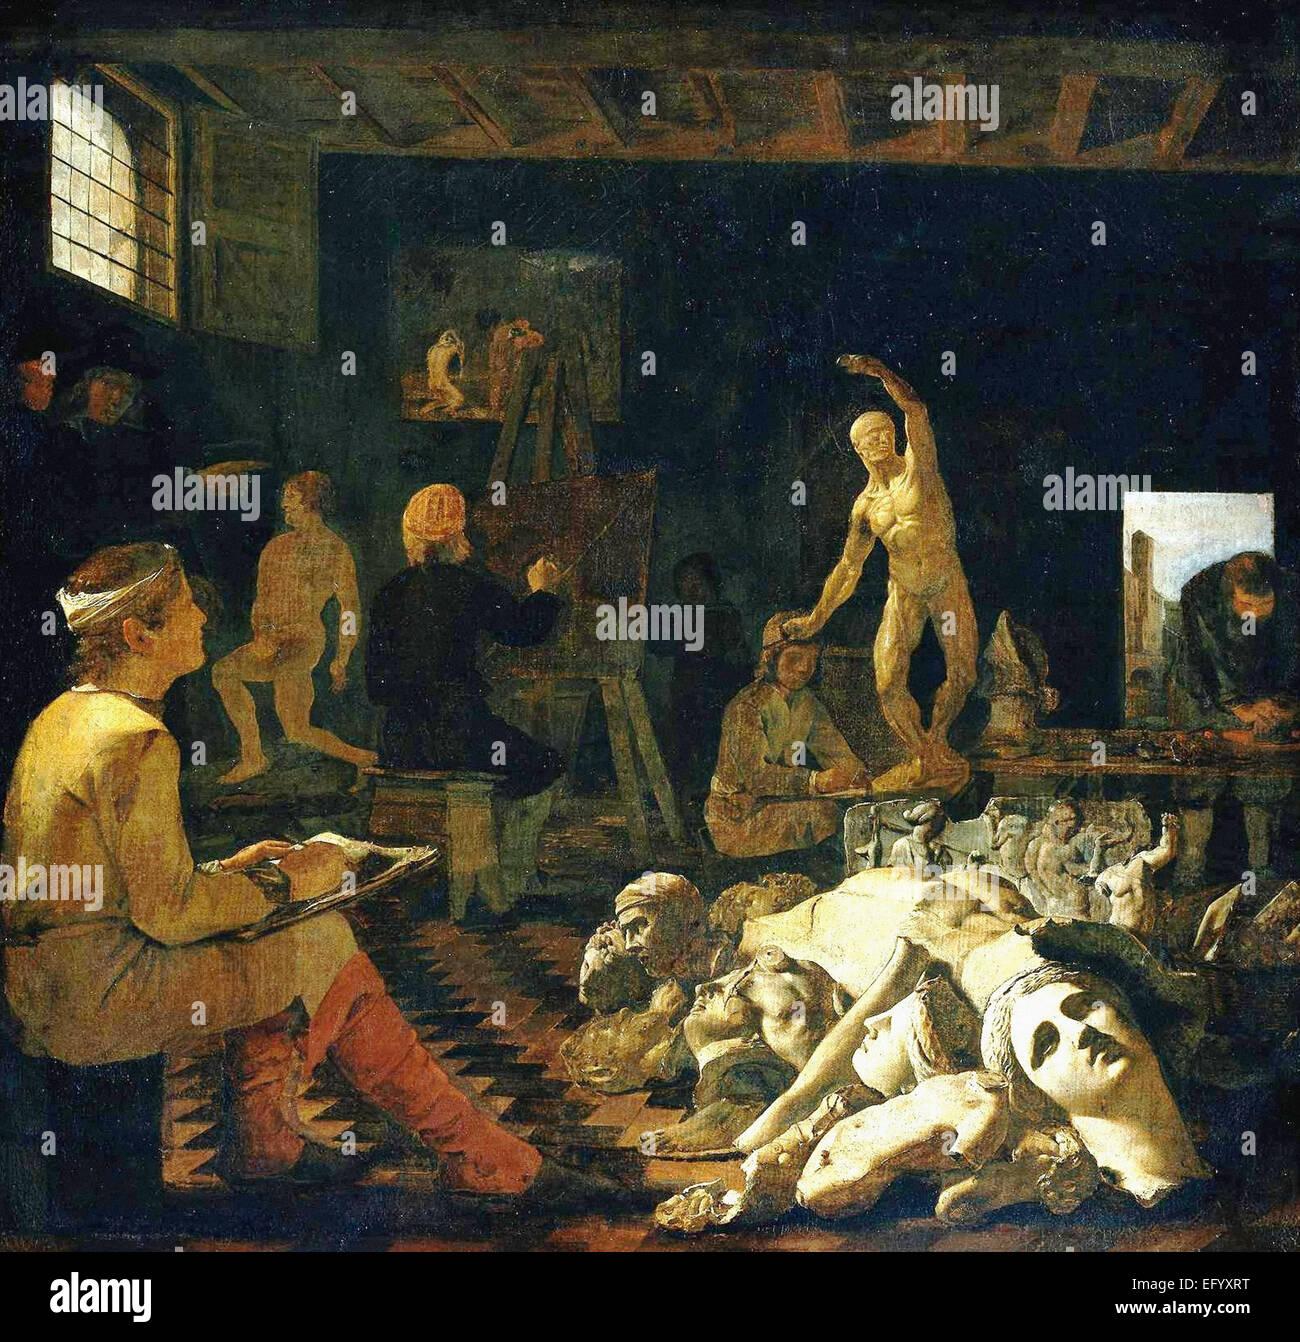 Michael Sweerts  The Painter's Studio - Stock Image